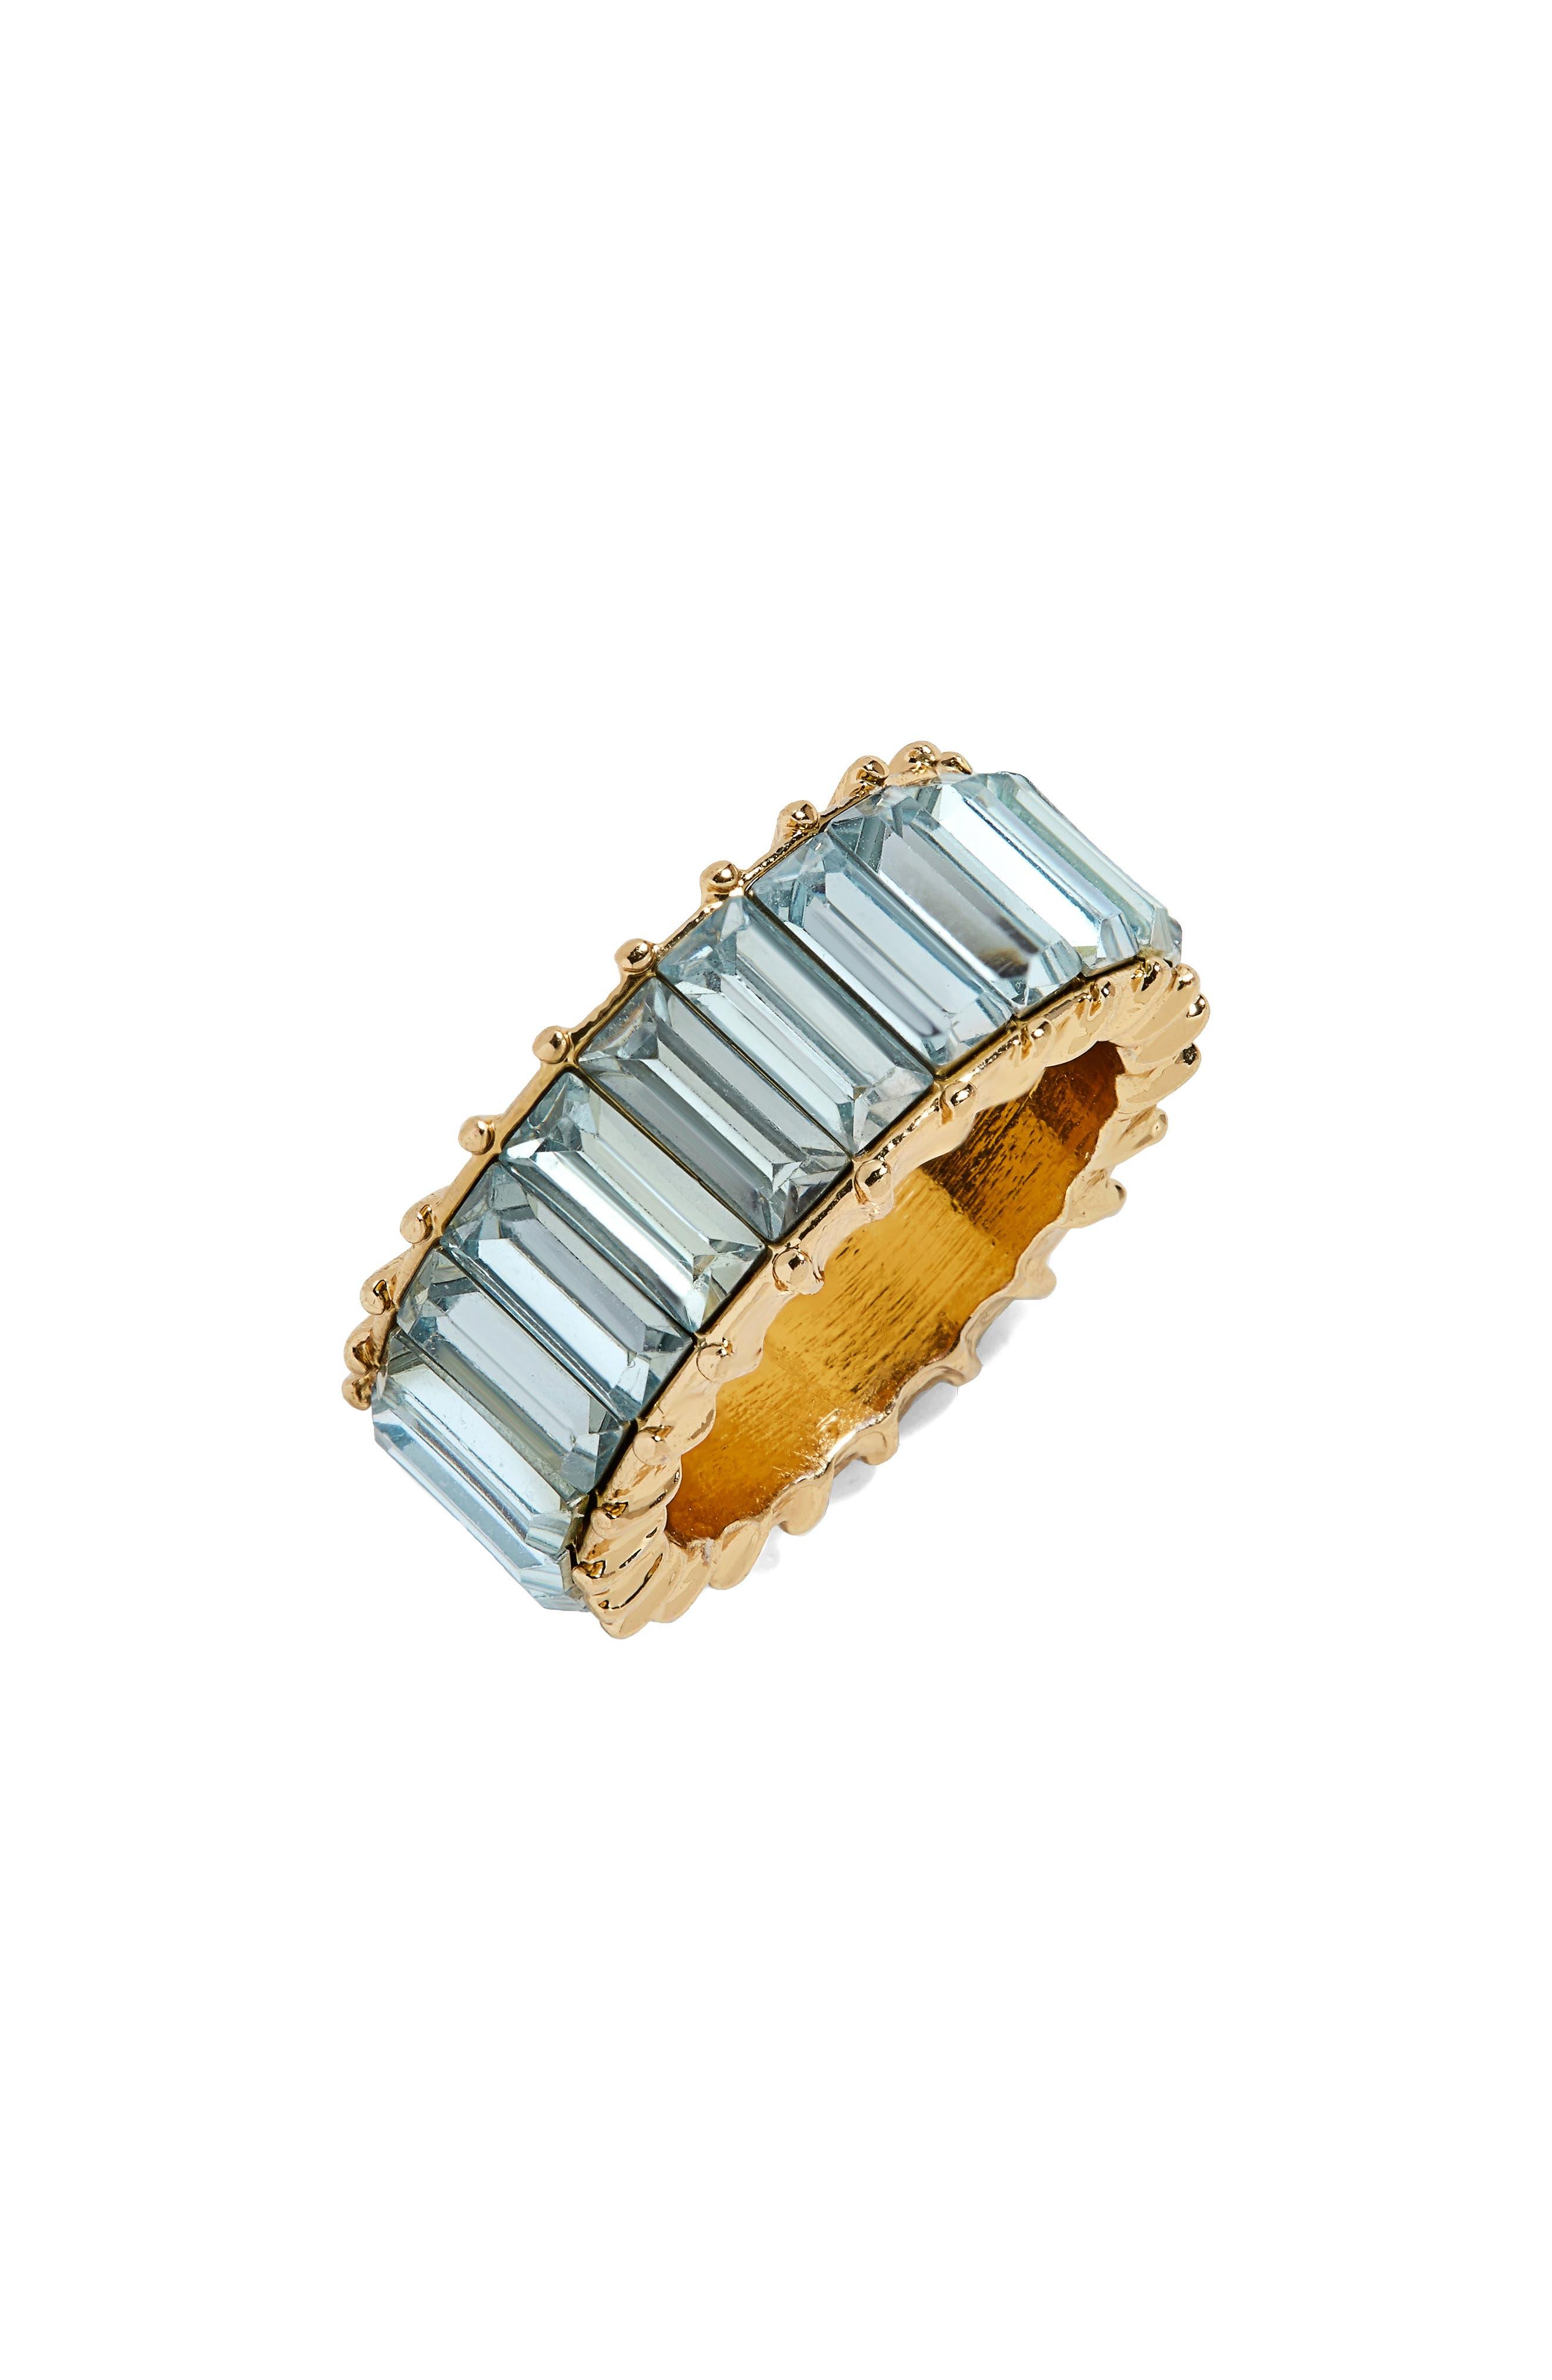 BAUBLEBAR, Alidia Ring, Main thumbnail 1, color, LIGHT BLUE